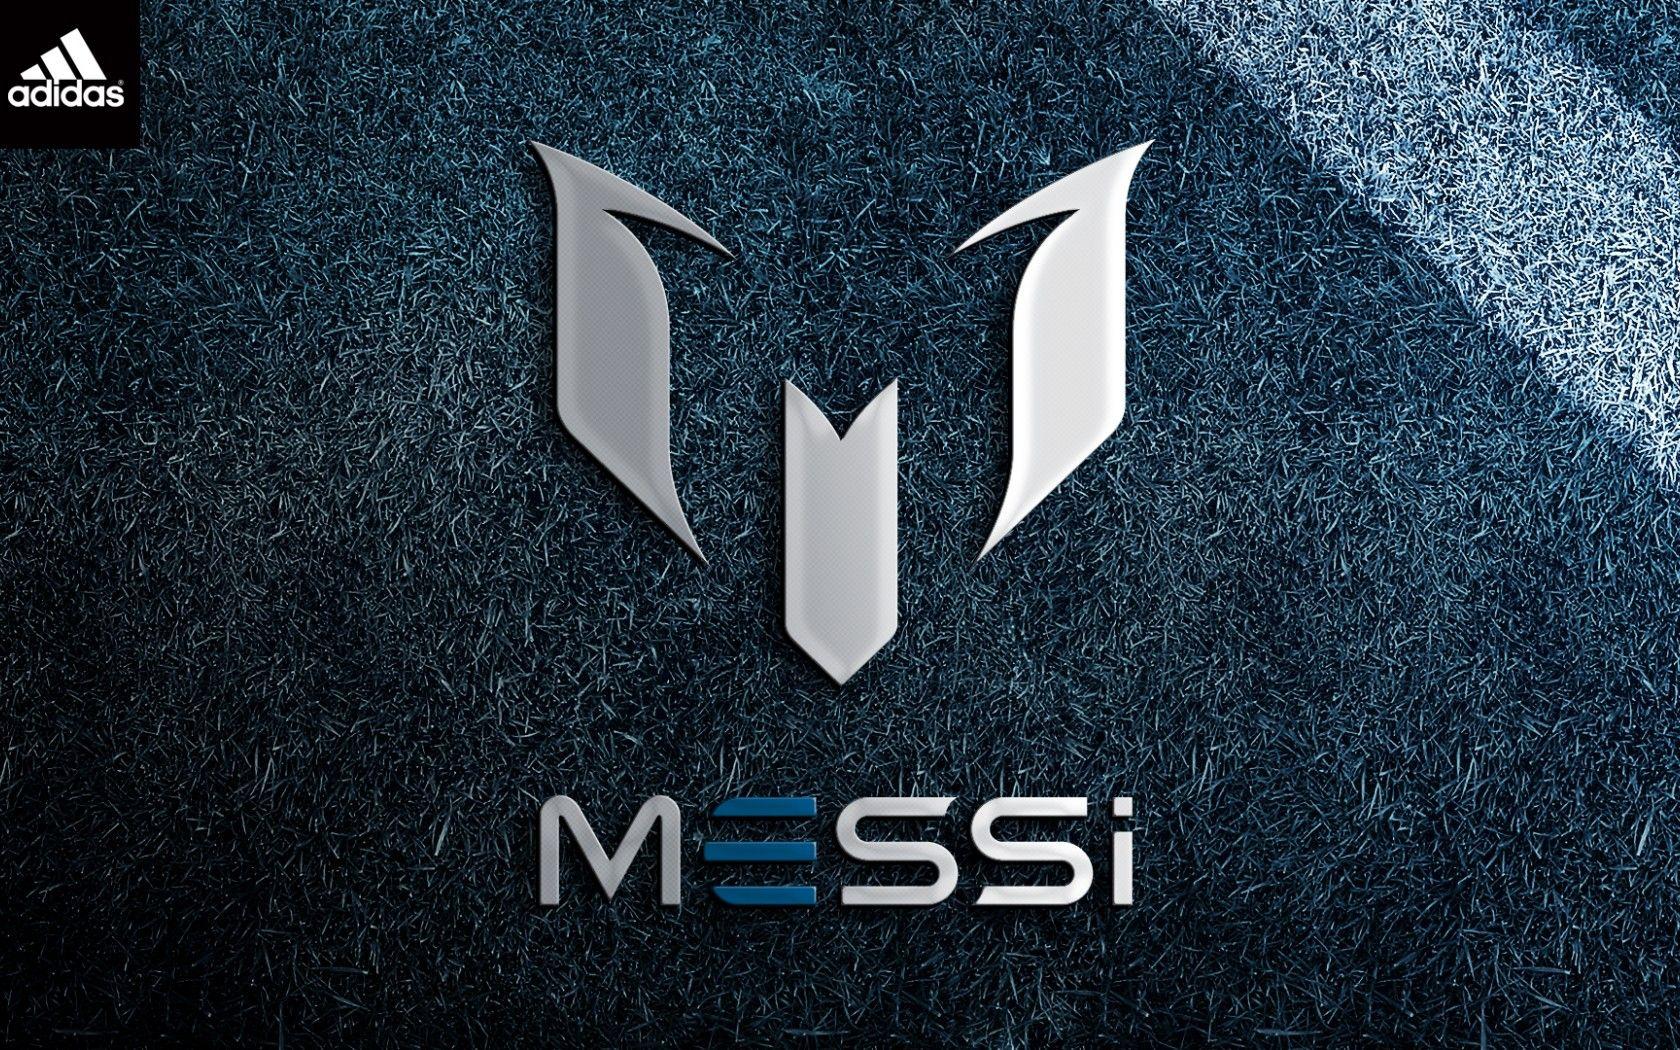 Messi And Adidas Logo Wallpaper   Widescreen Wallpapers  High. Adidas 2015 Wallpaper   WallpaperSafari